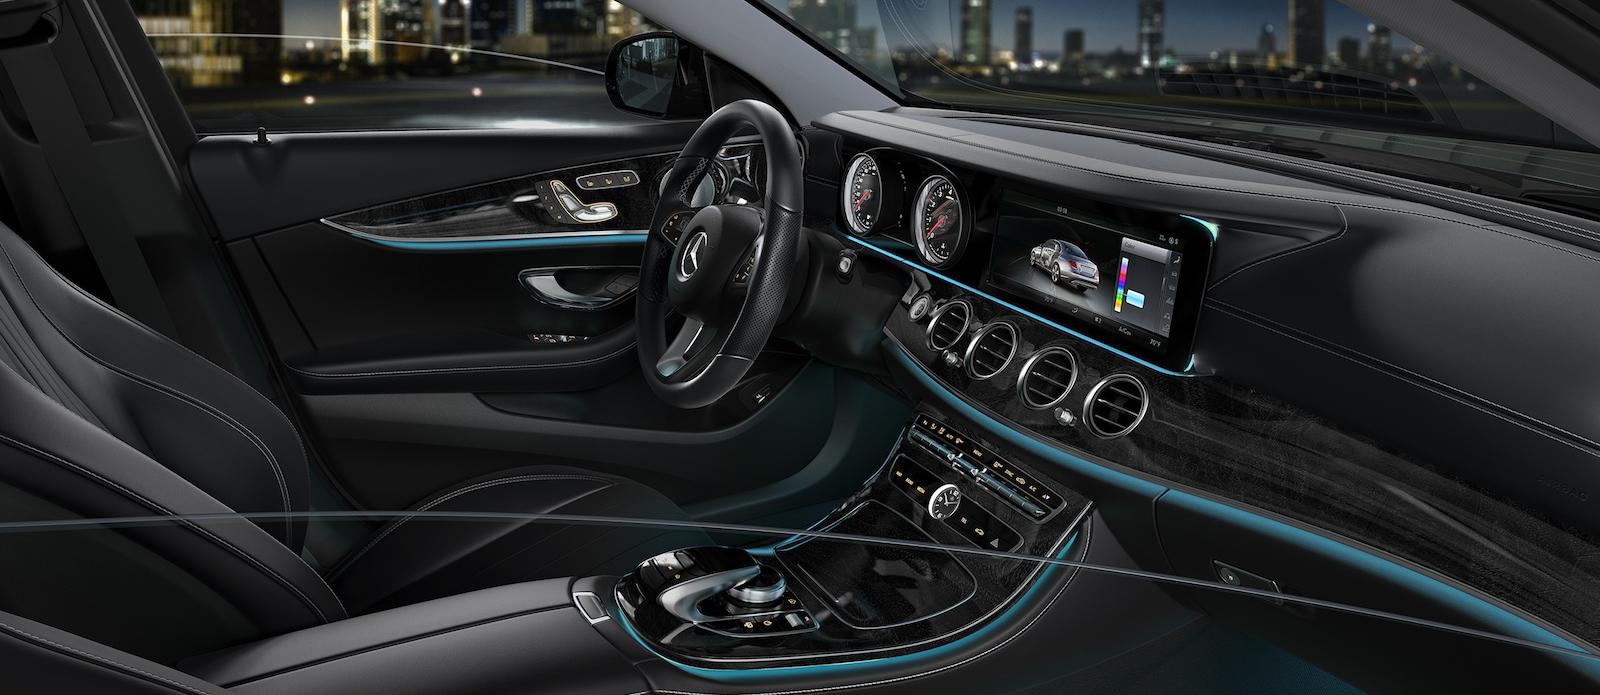 2017 Mercedes E-Class Safety